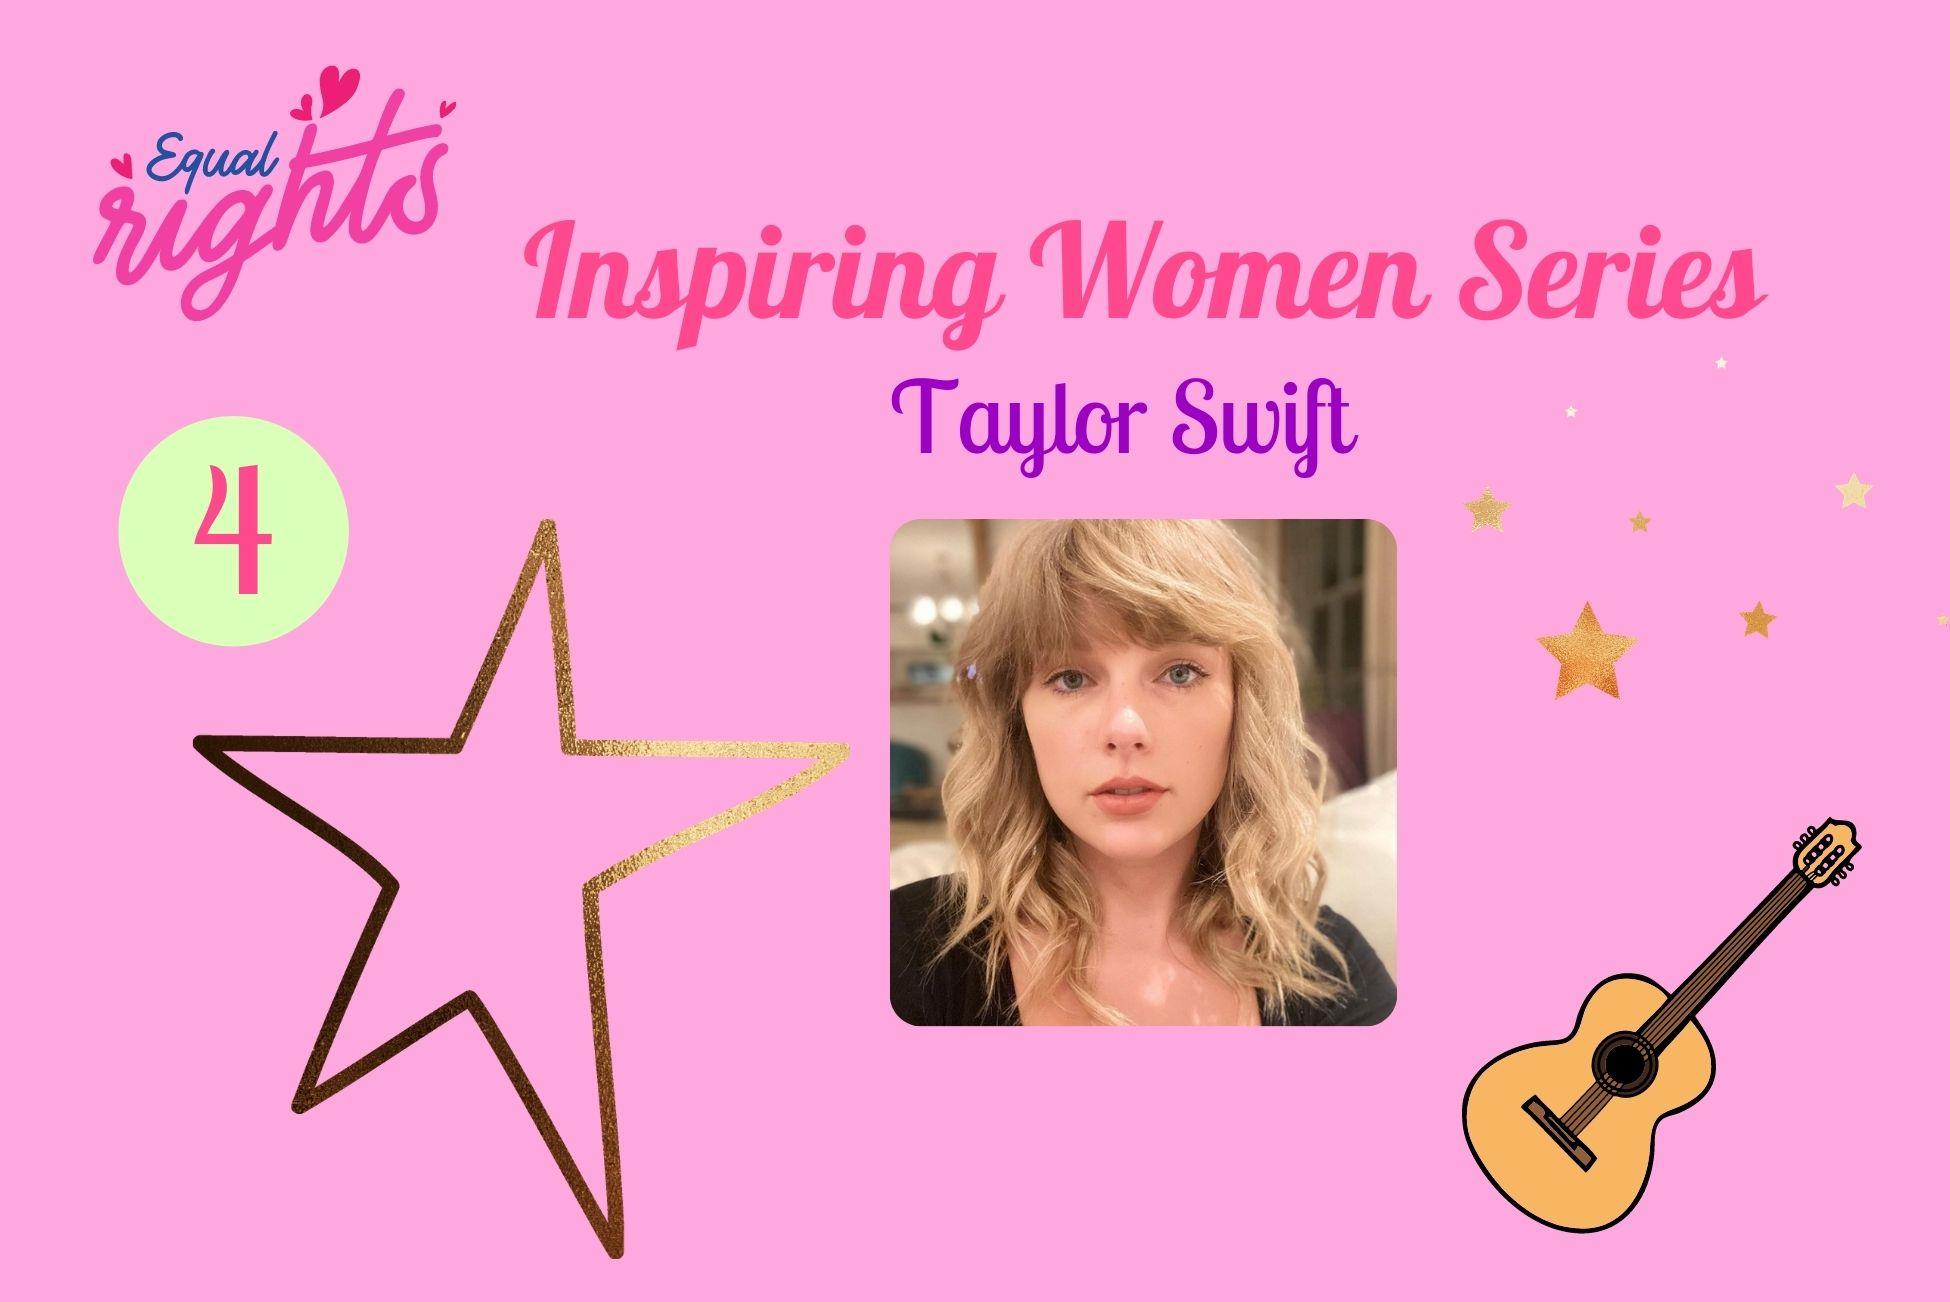 Inspiring Women Series – deel 4: Taylor Swift